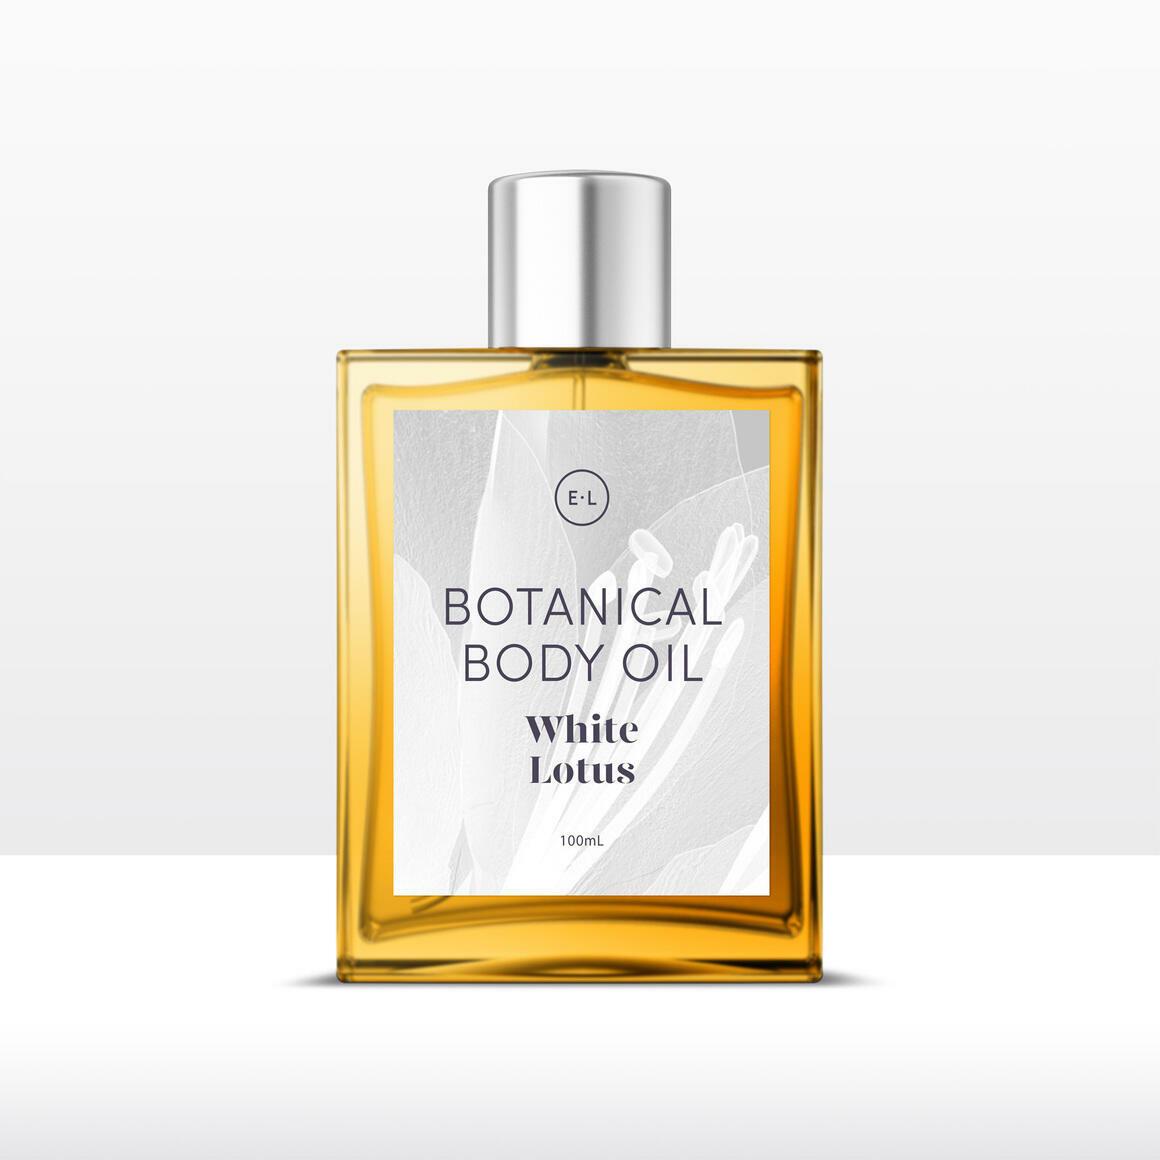 White lotus botanical body oil   Trada Marketplace